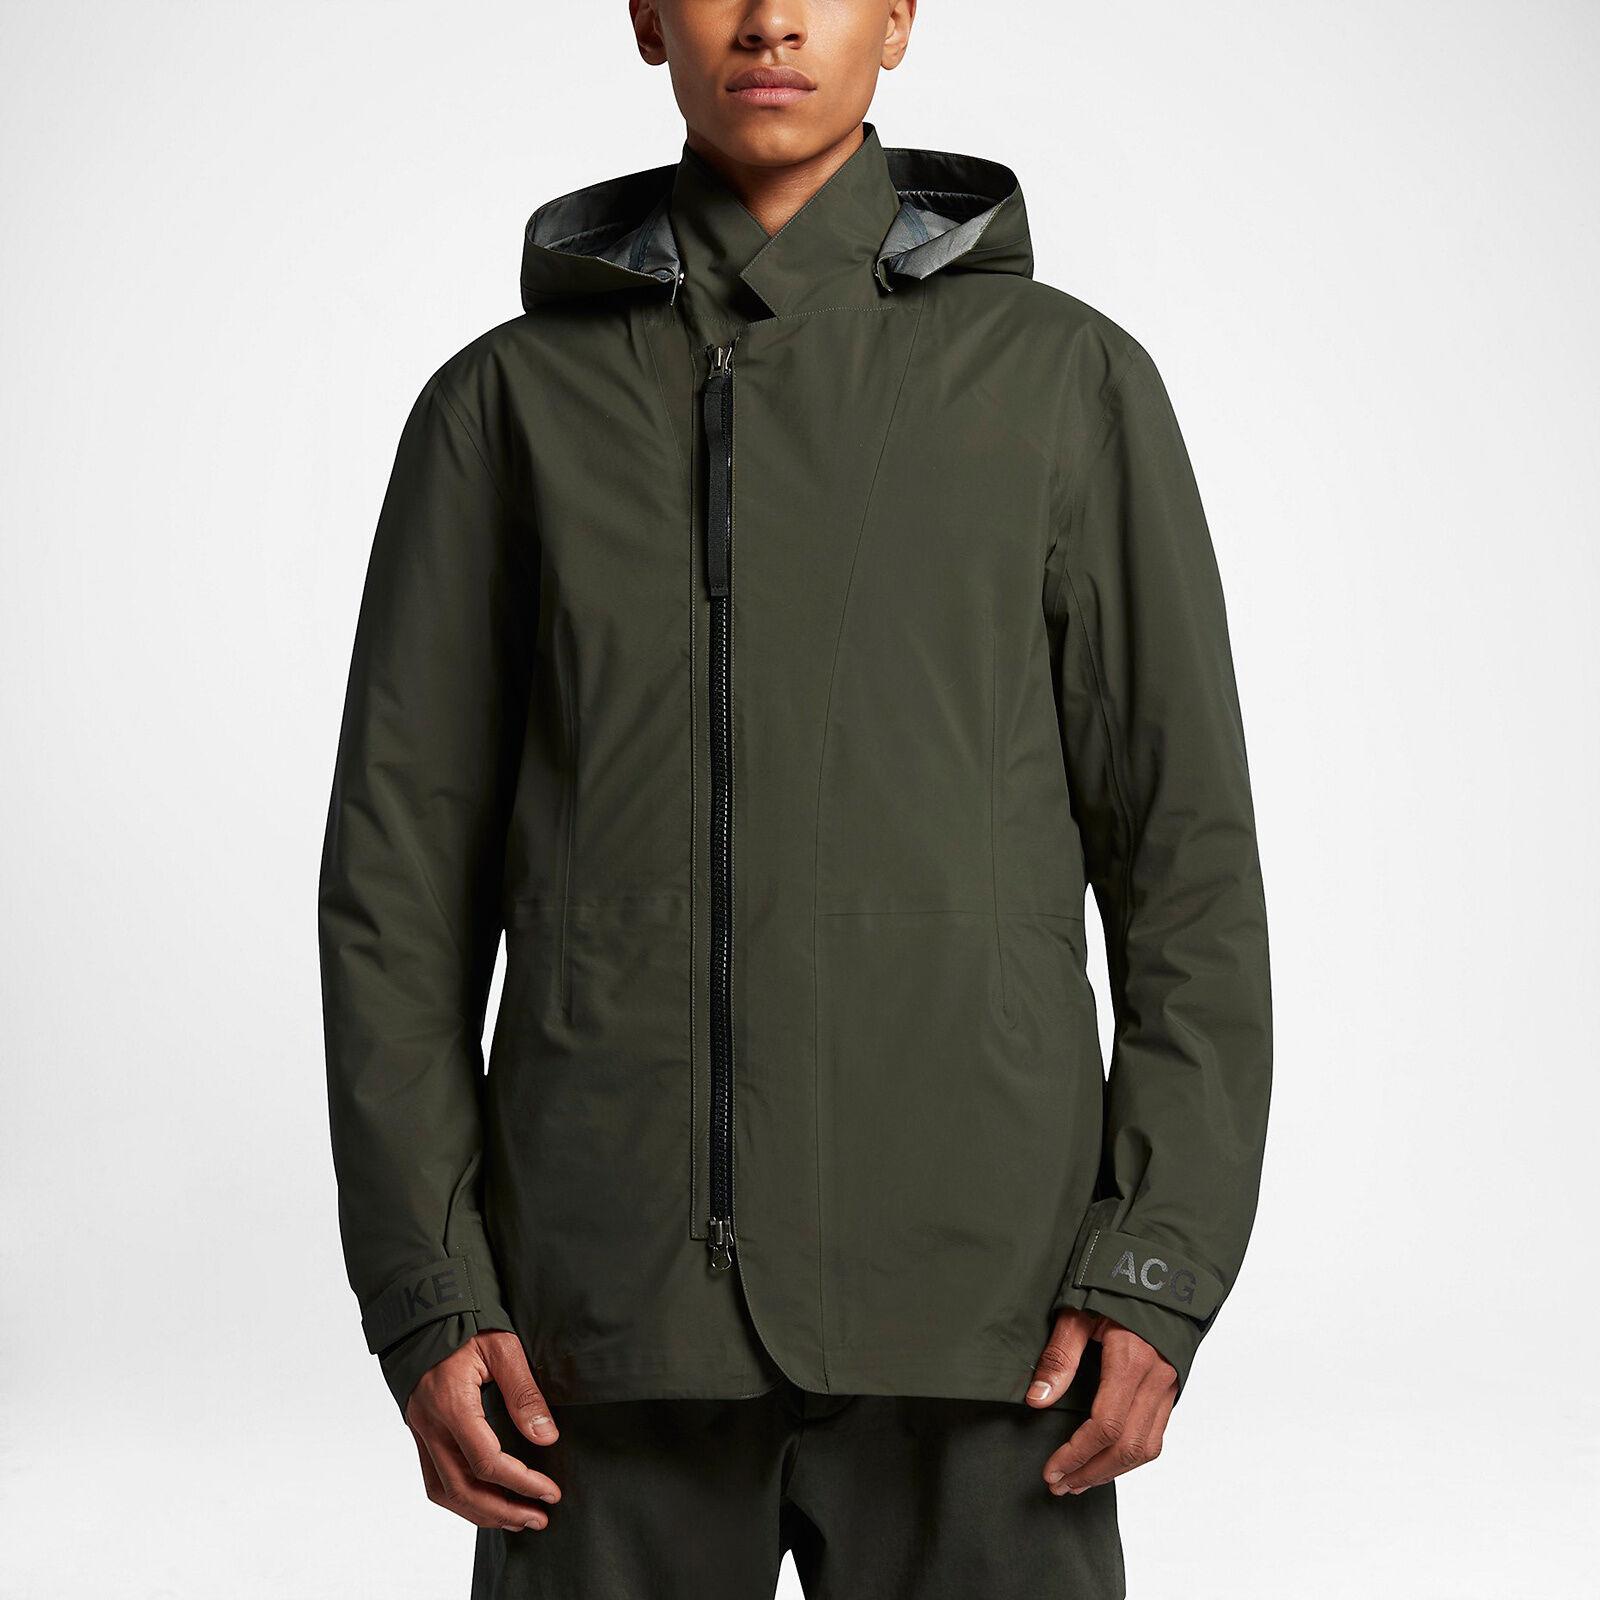 Nike NikeLab ACG System Blazer 3   1 Men Jacket 2xl Cargo Khaki ... b919efe4d